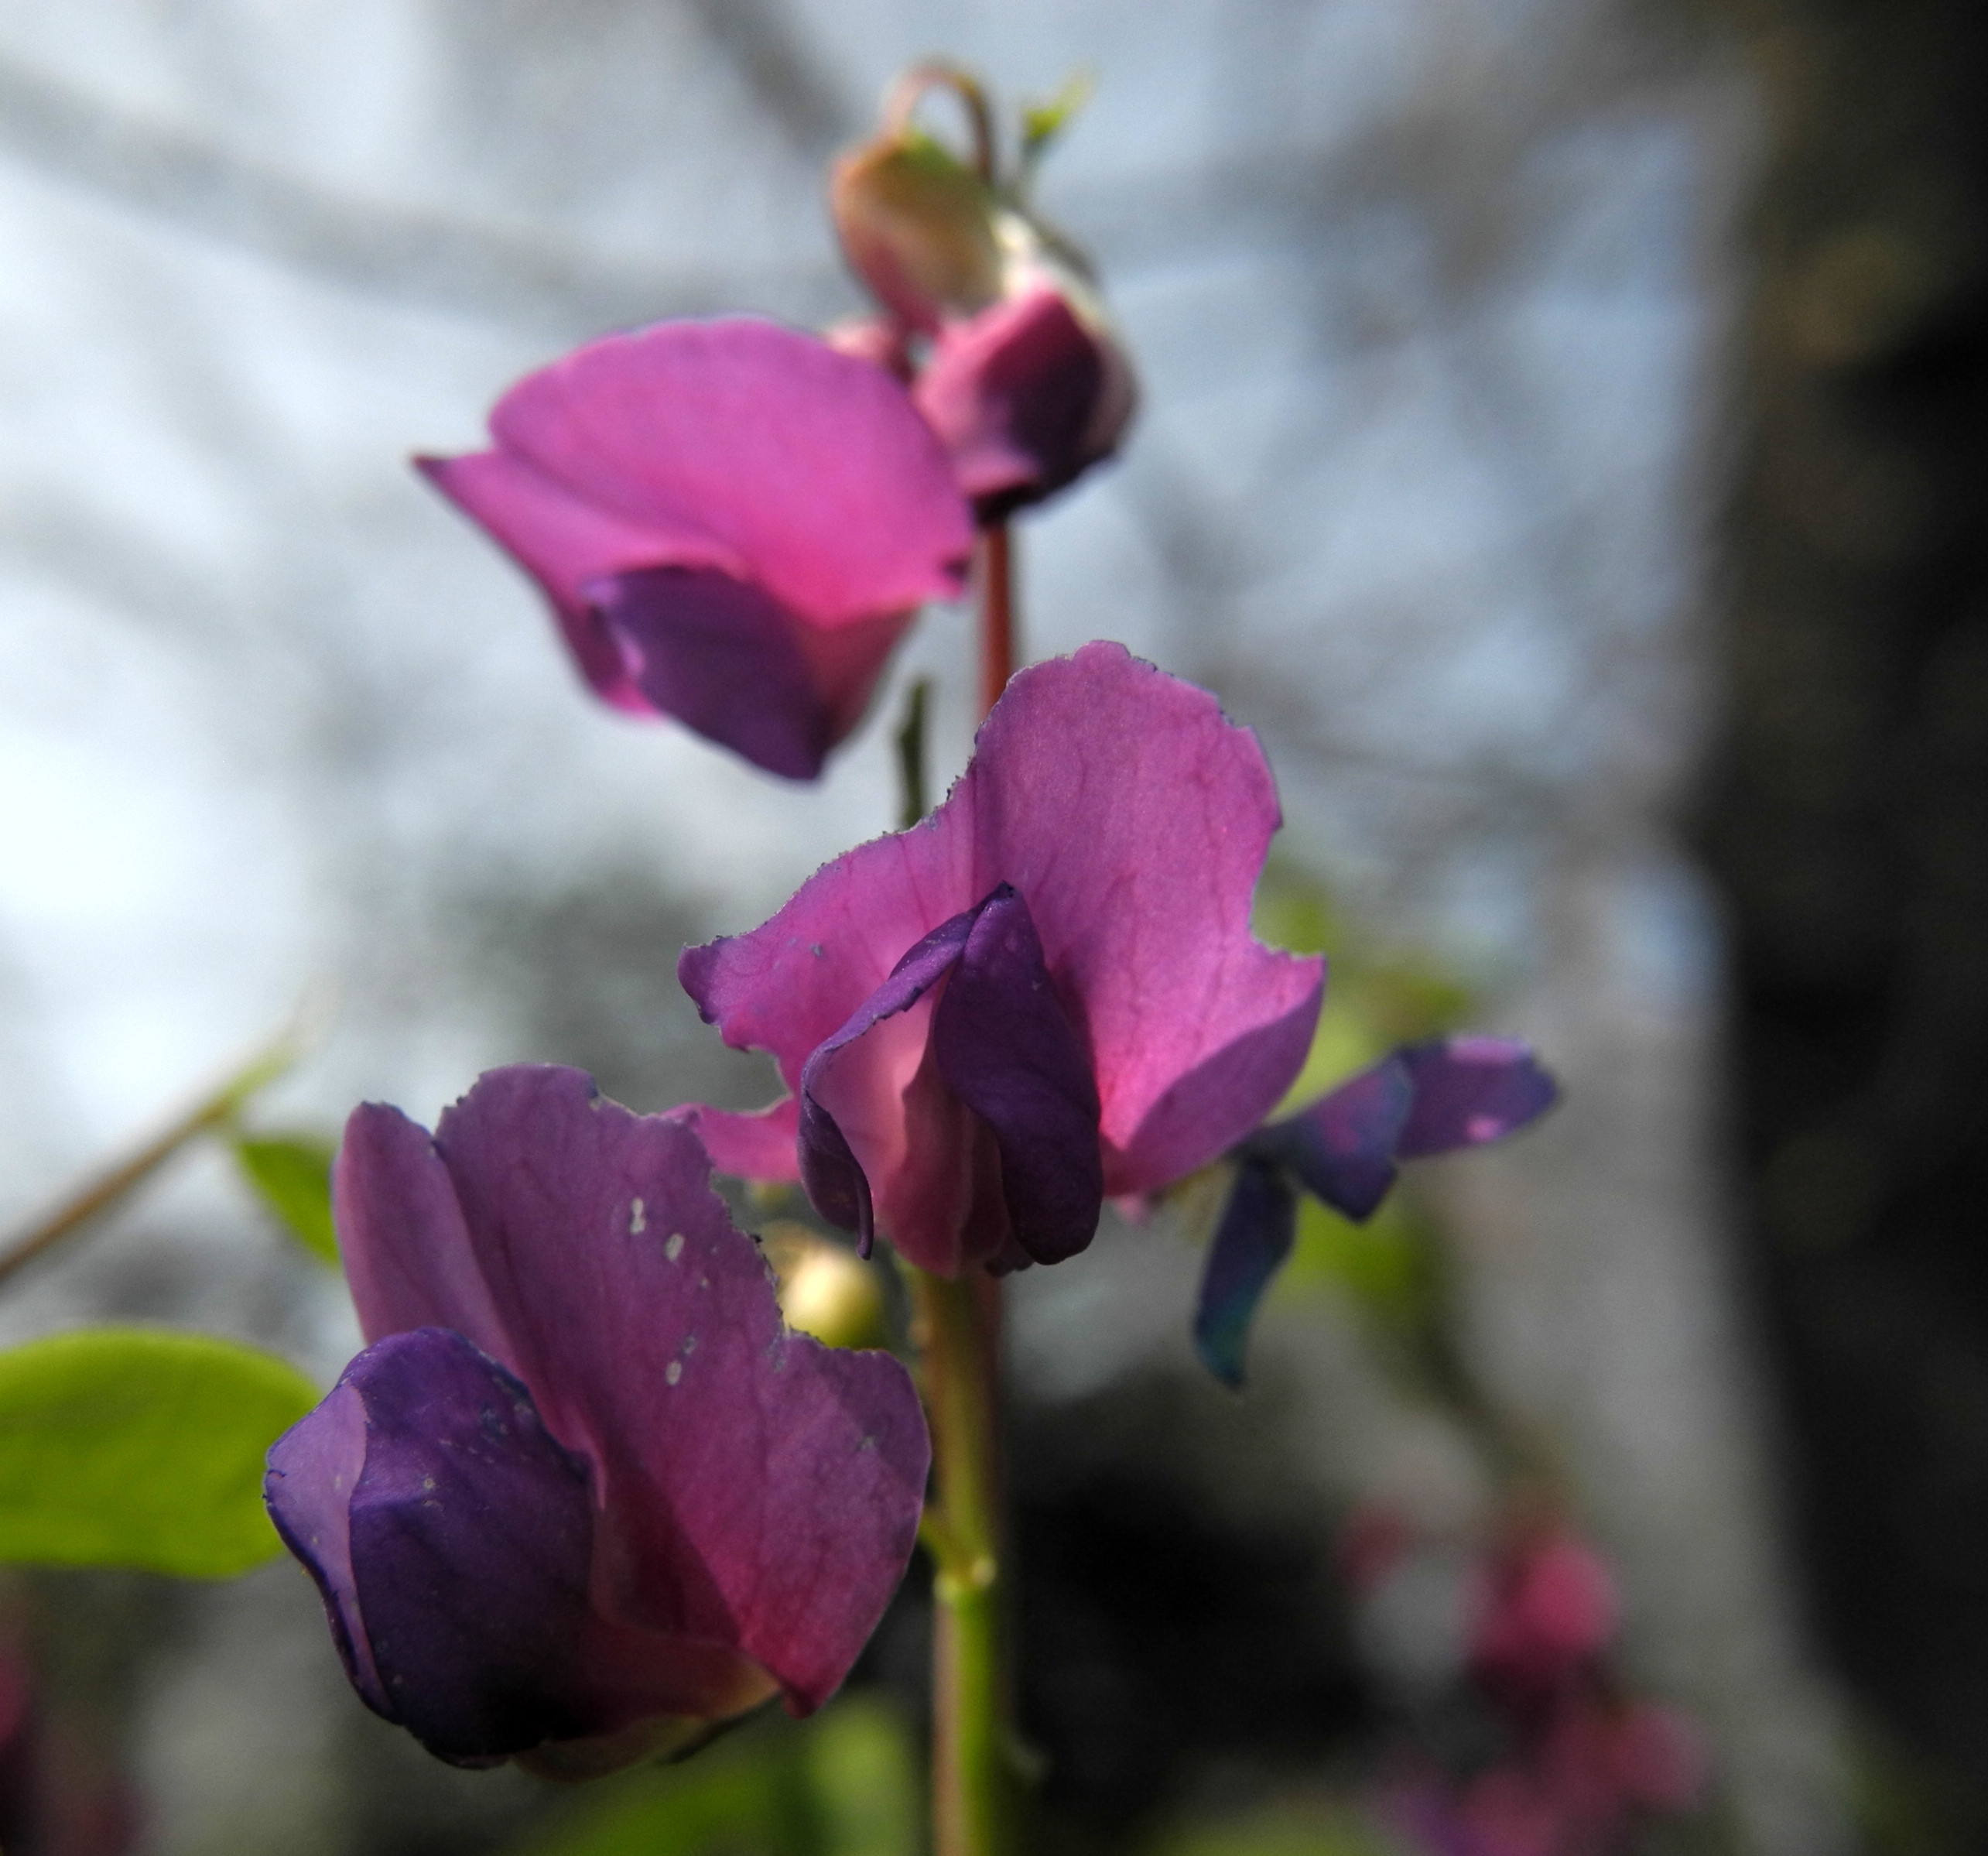 Fruehlings-Platterbse-Bluete-lila_Lathyrus-vernus04